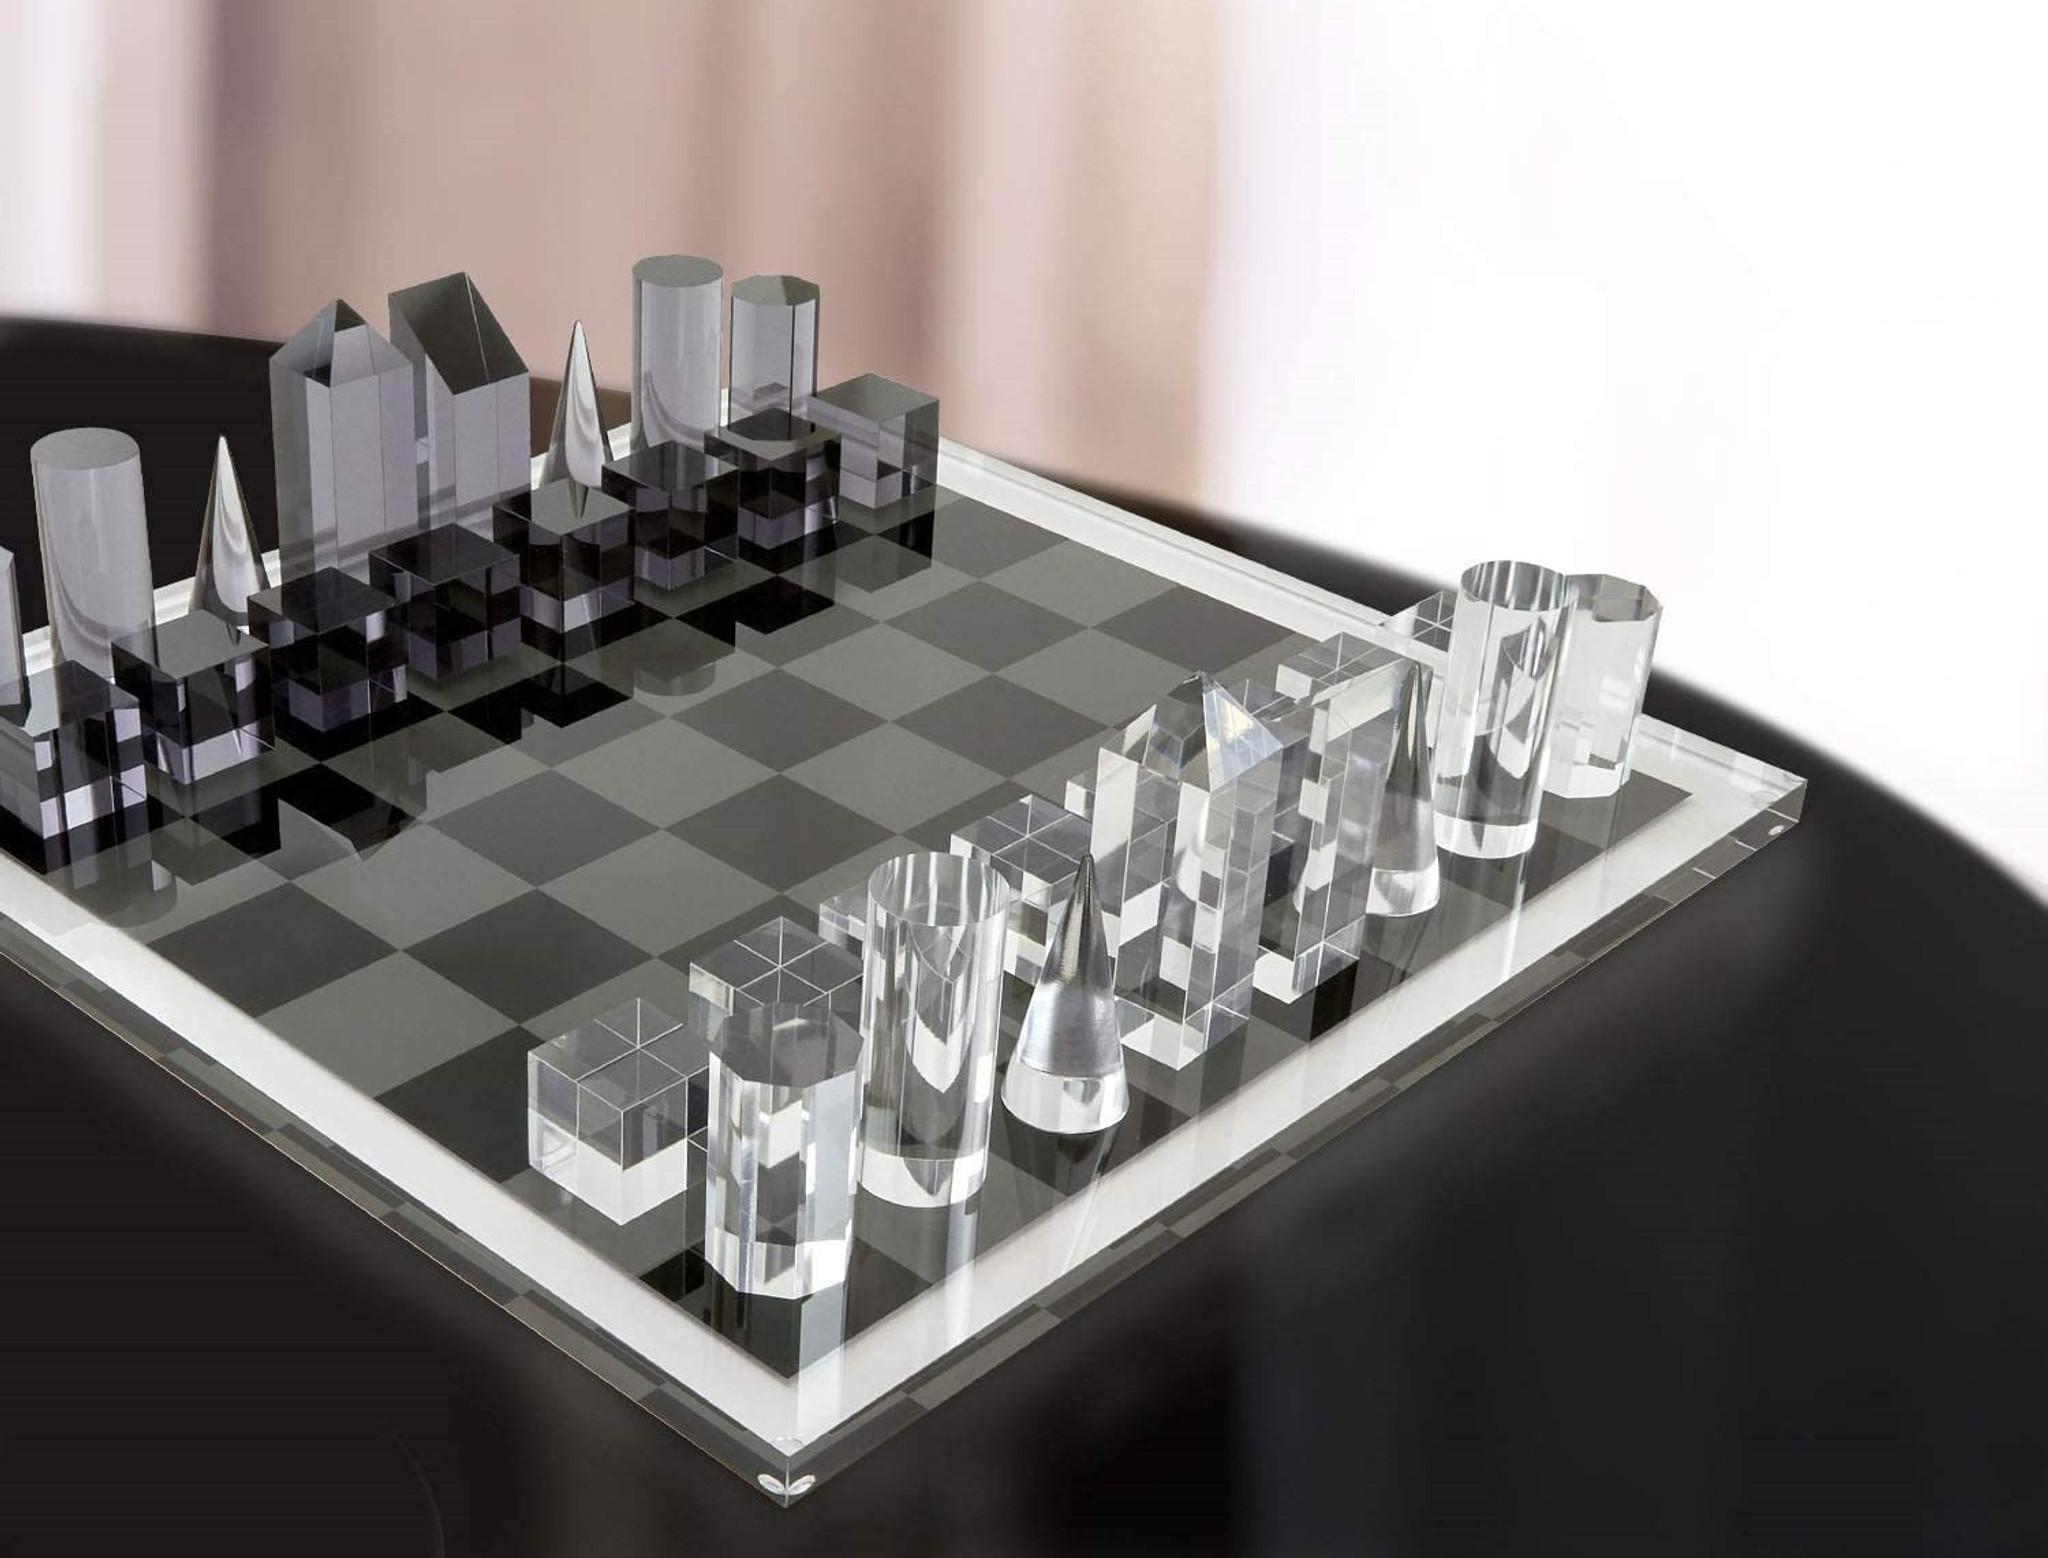 tizo luxury acrylic skyscraper black and white chess set luxury lucite